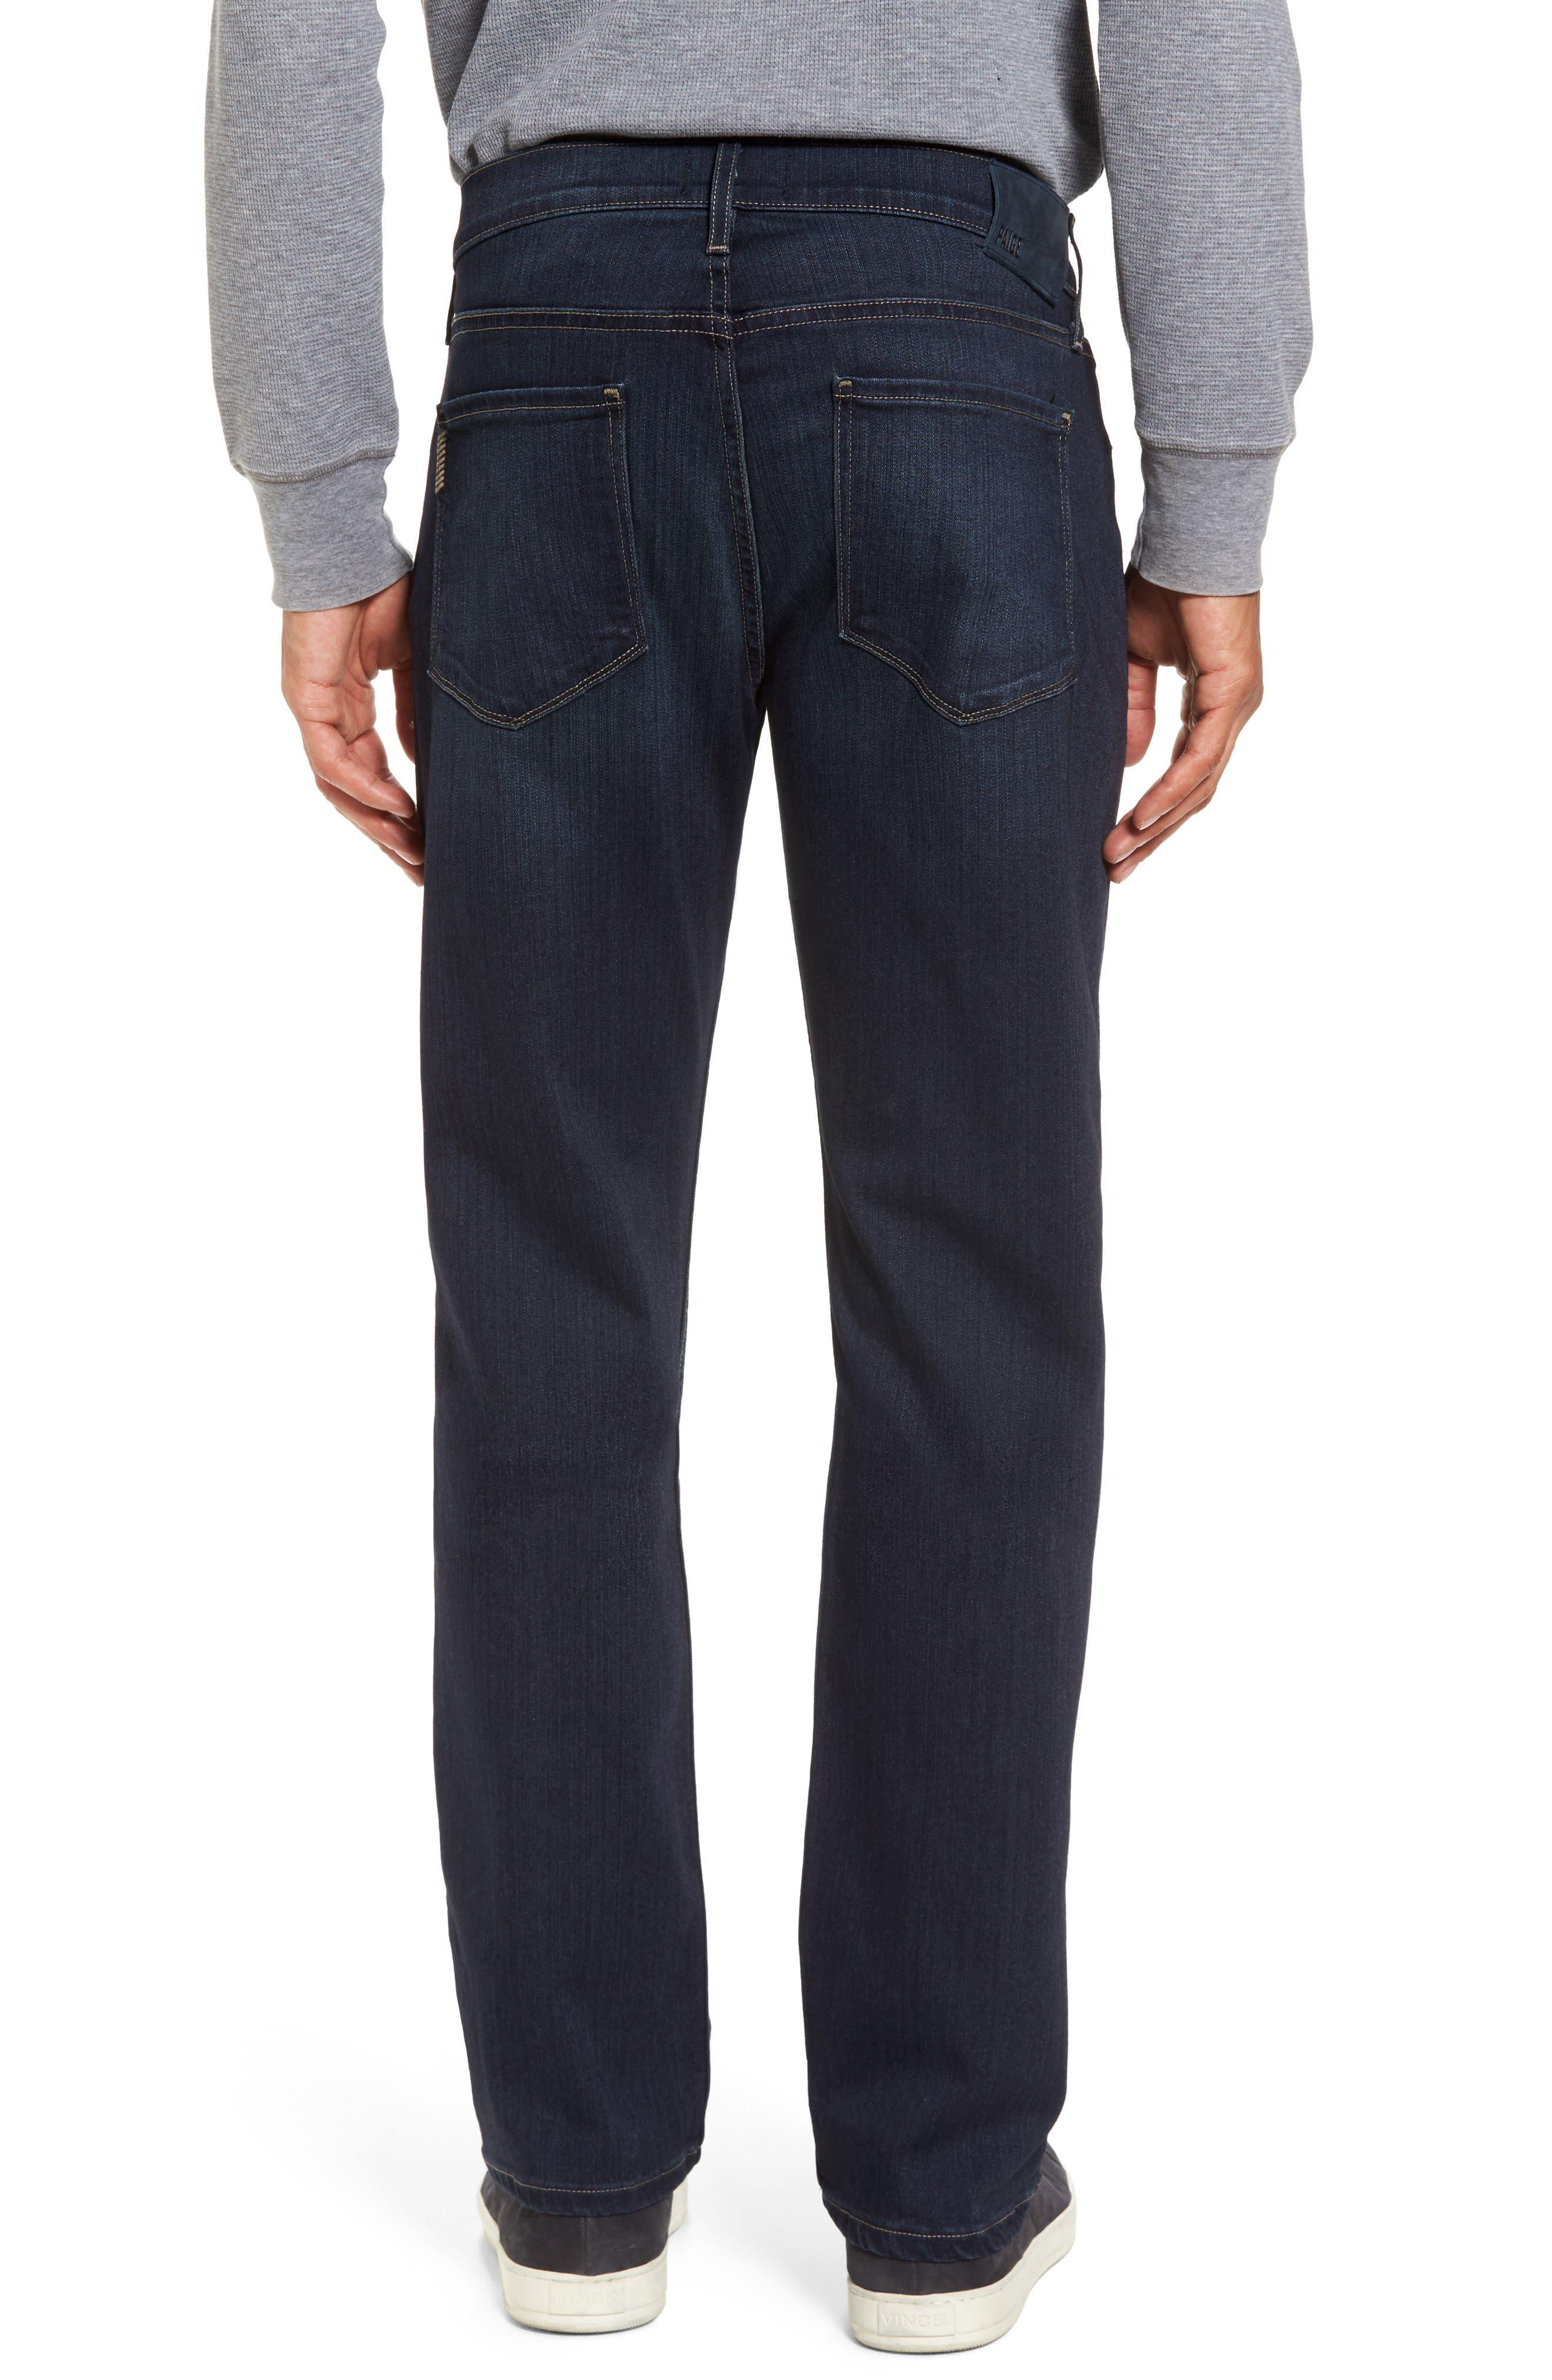 Transcend - Normandie Straight Fit Jeans,                             Alternate thumbnail 2, color,